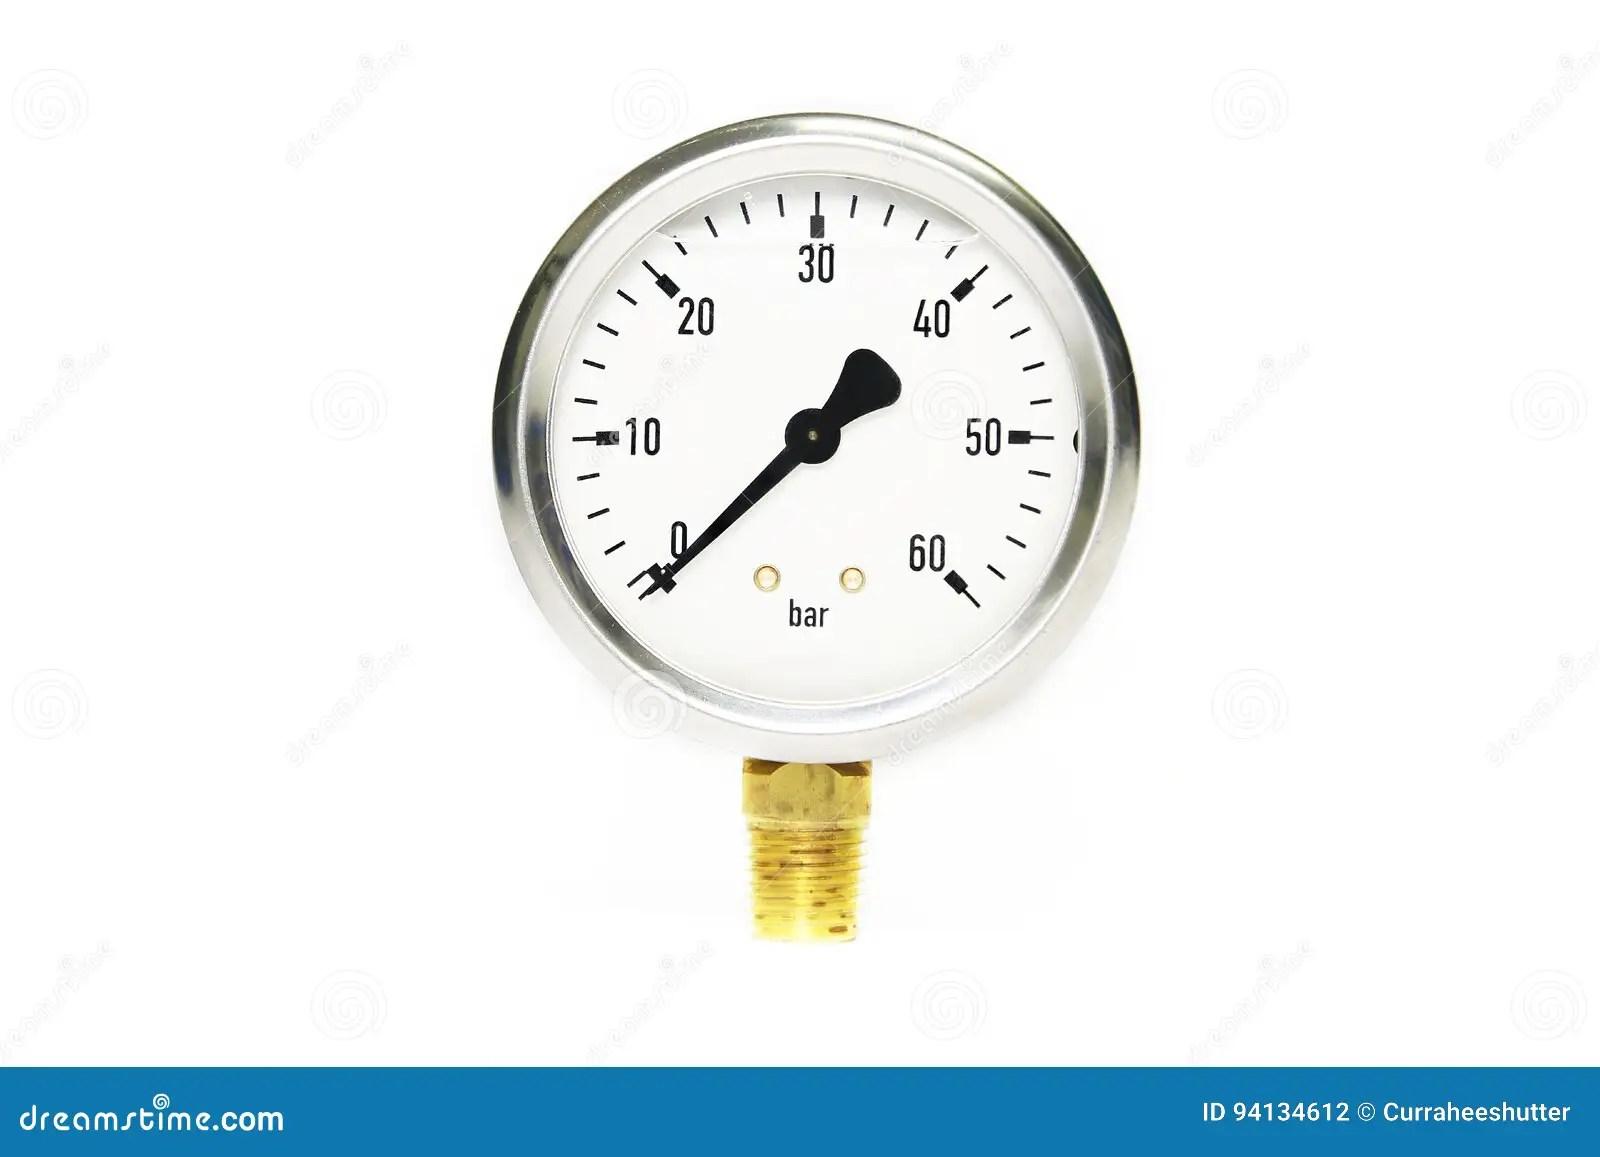 Pressure Gauge Using Measure The Pressure In Production